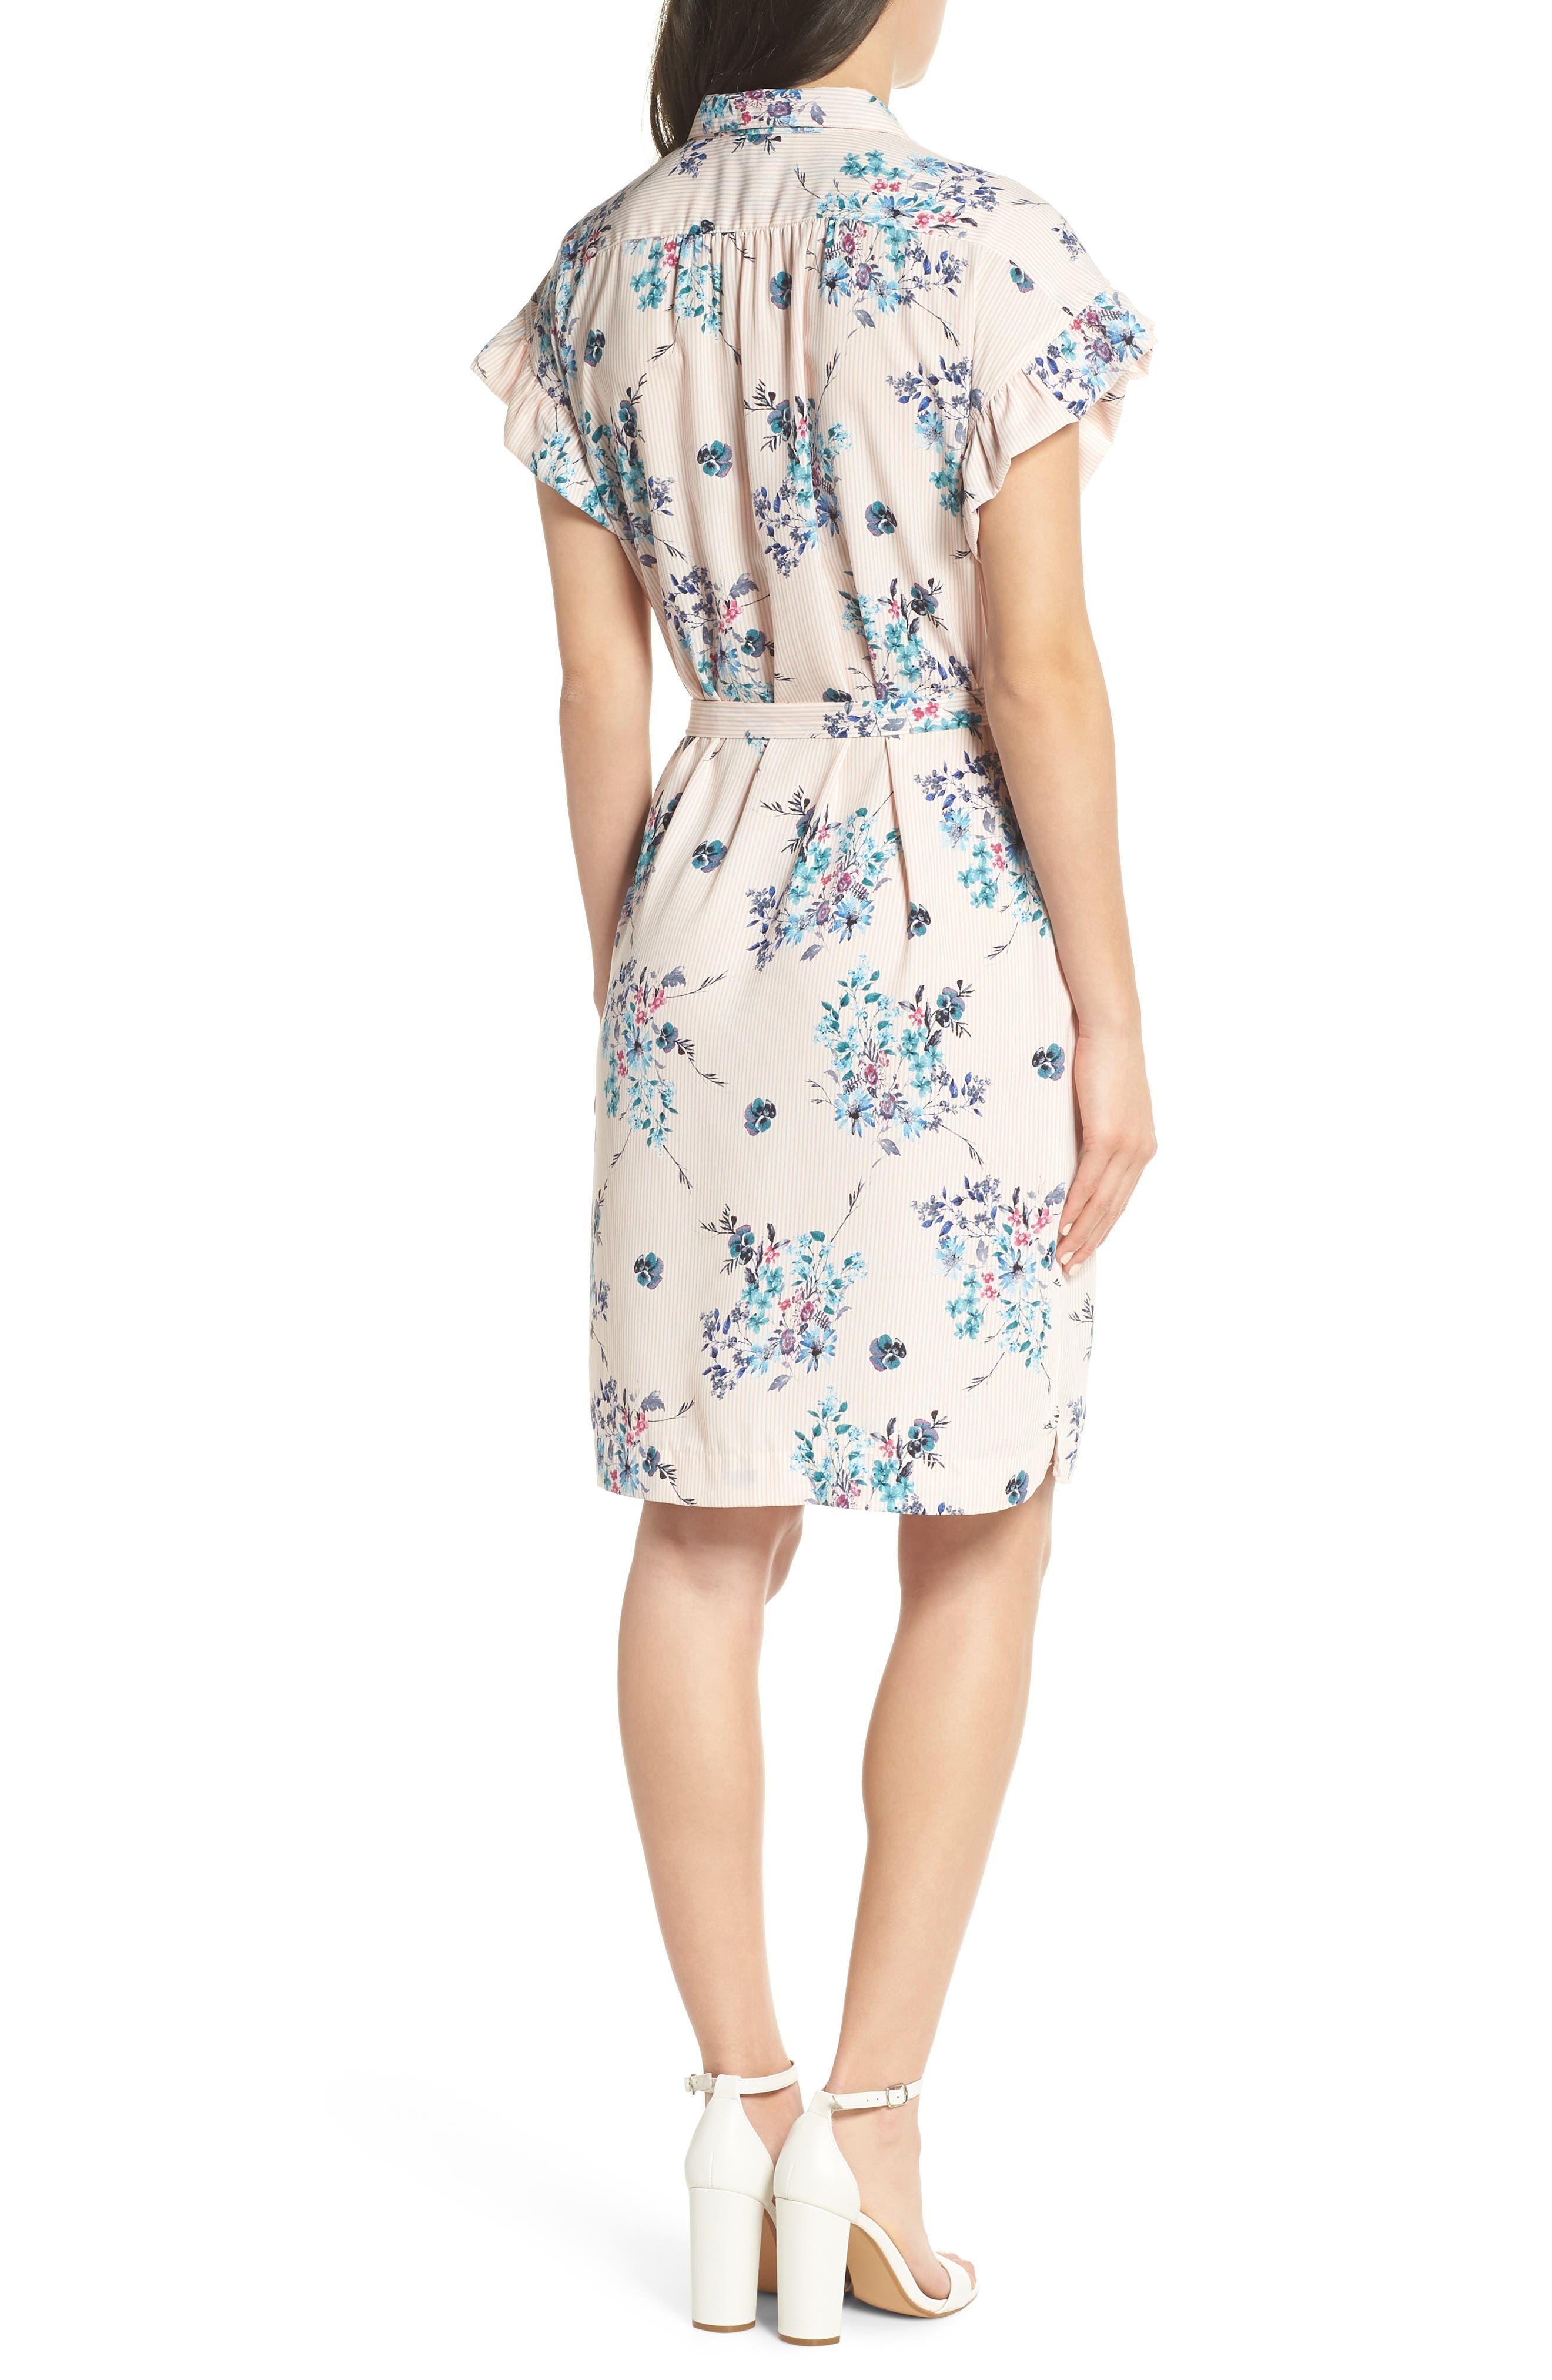 MARY & MABEL,                             Ruffle Sleeve Shirt Dress,                             Alternate thumbnail 2, color,                             652